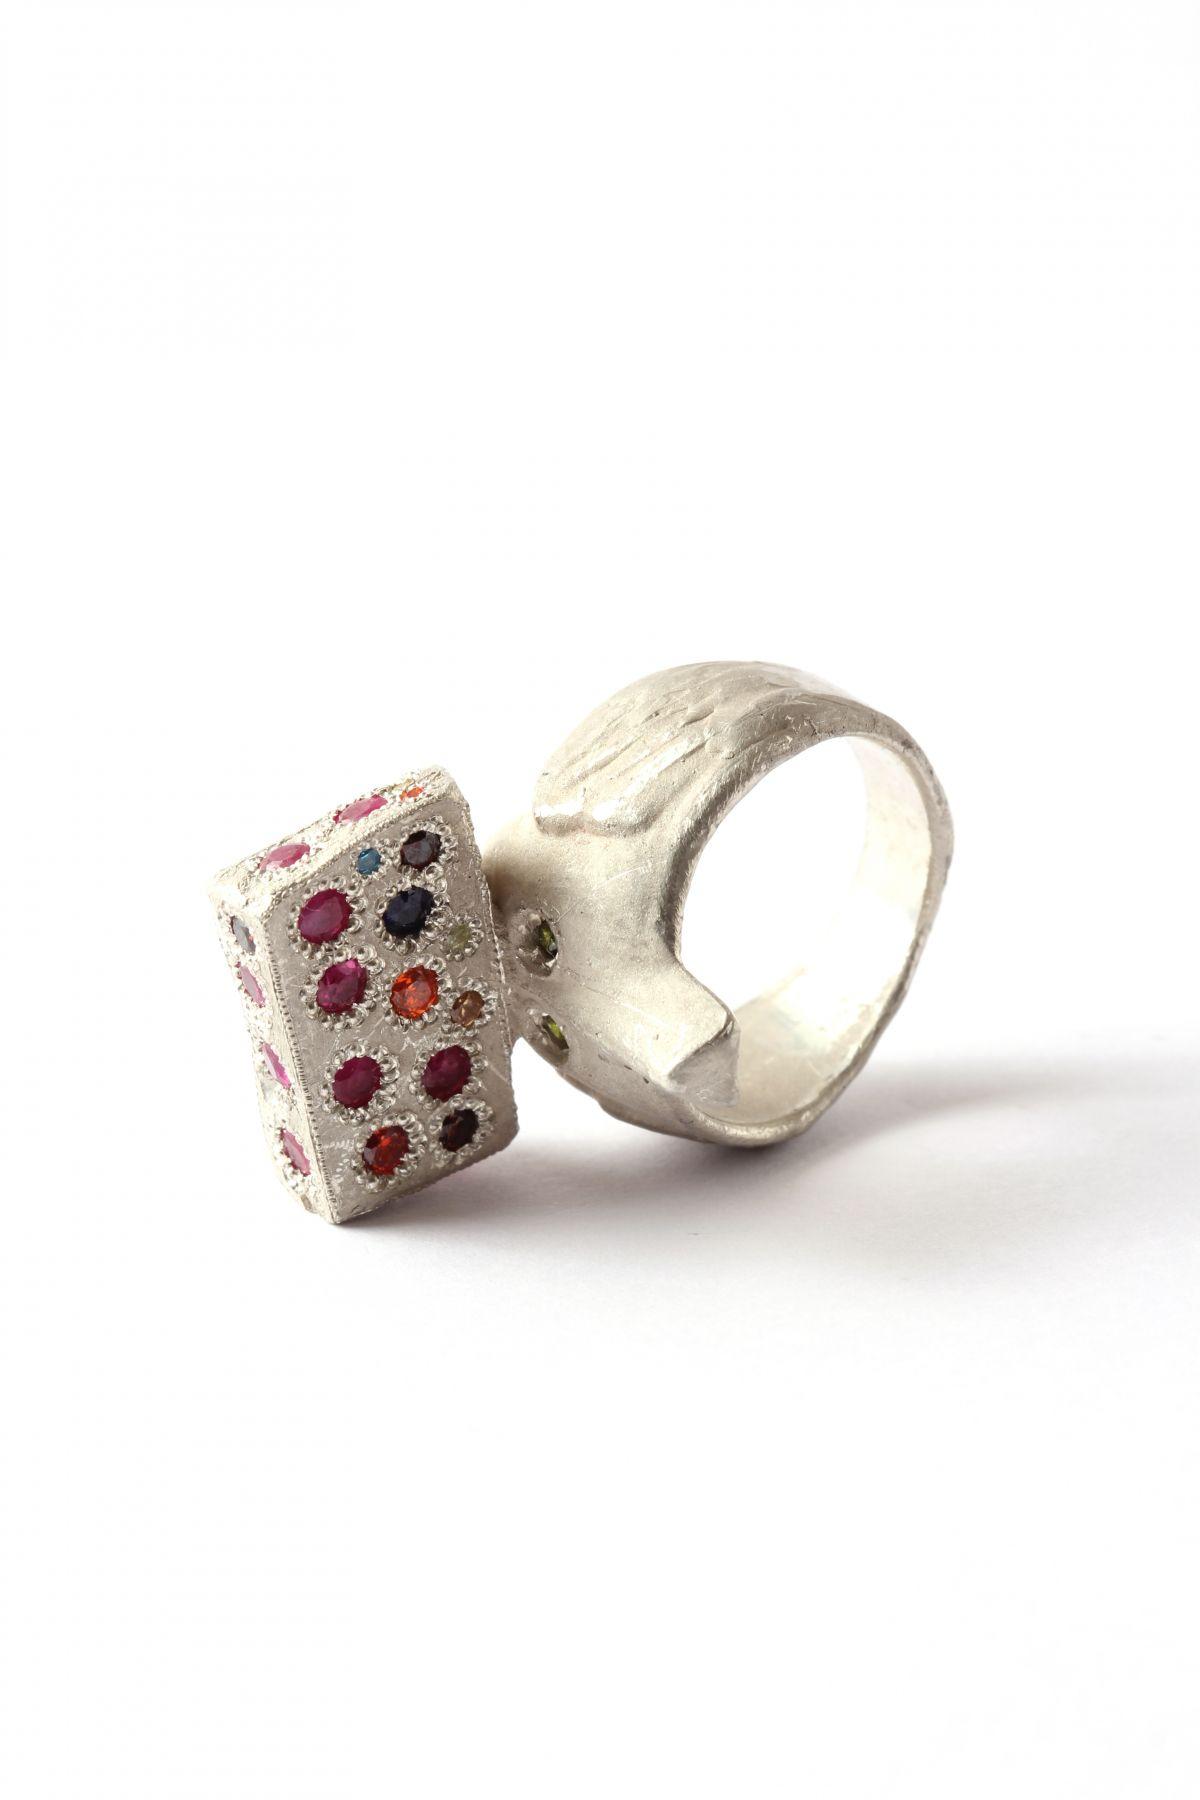 Karl Fritsch, Ring